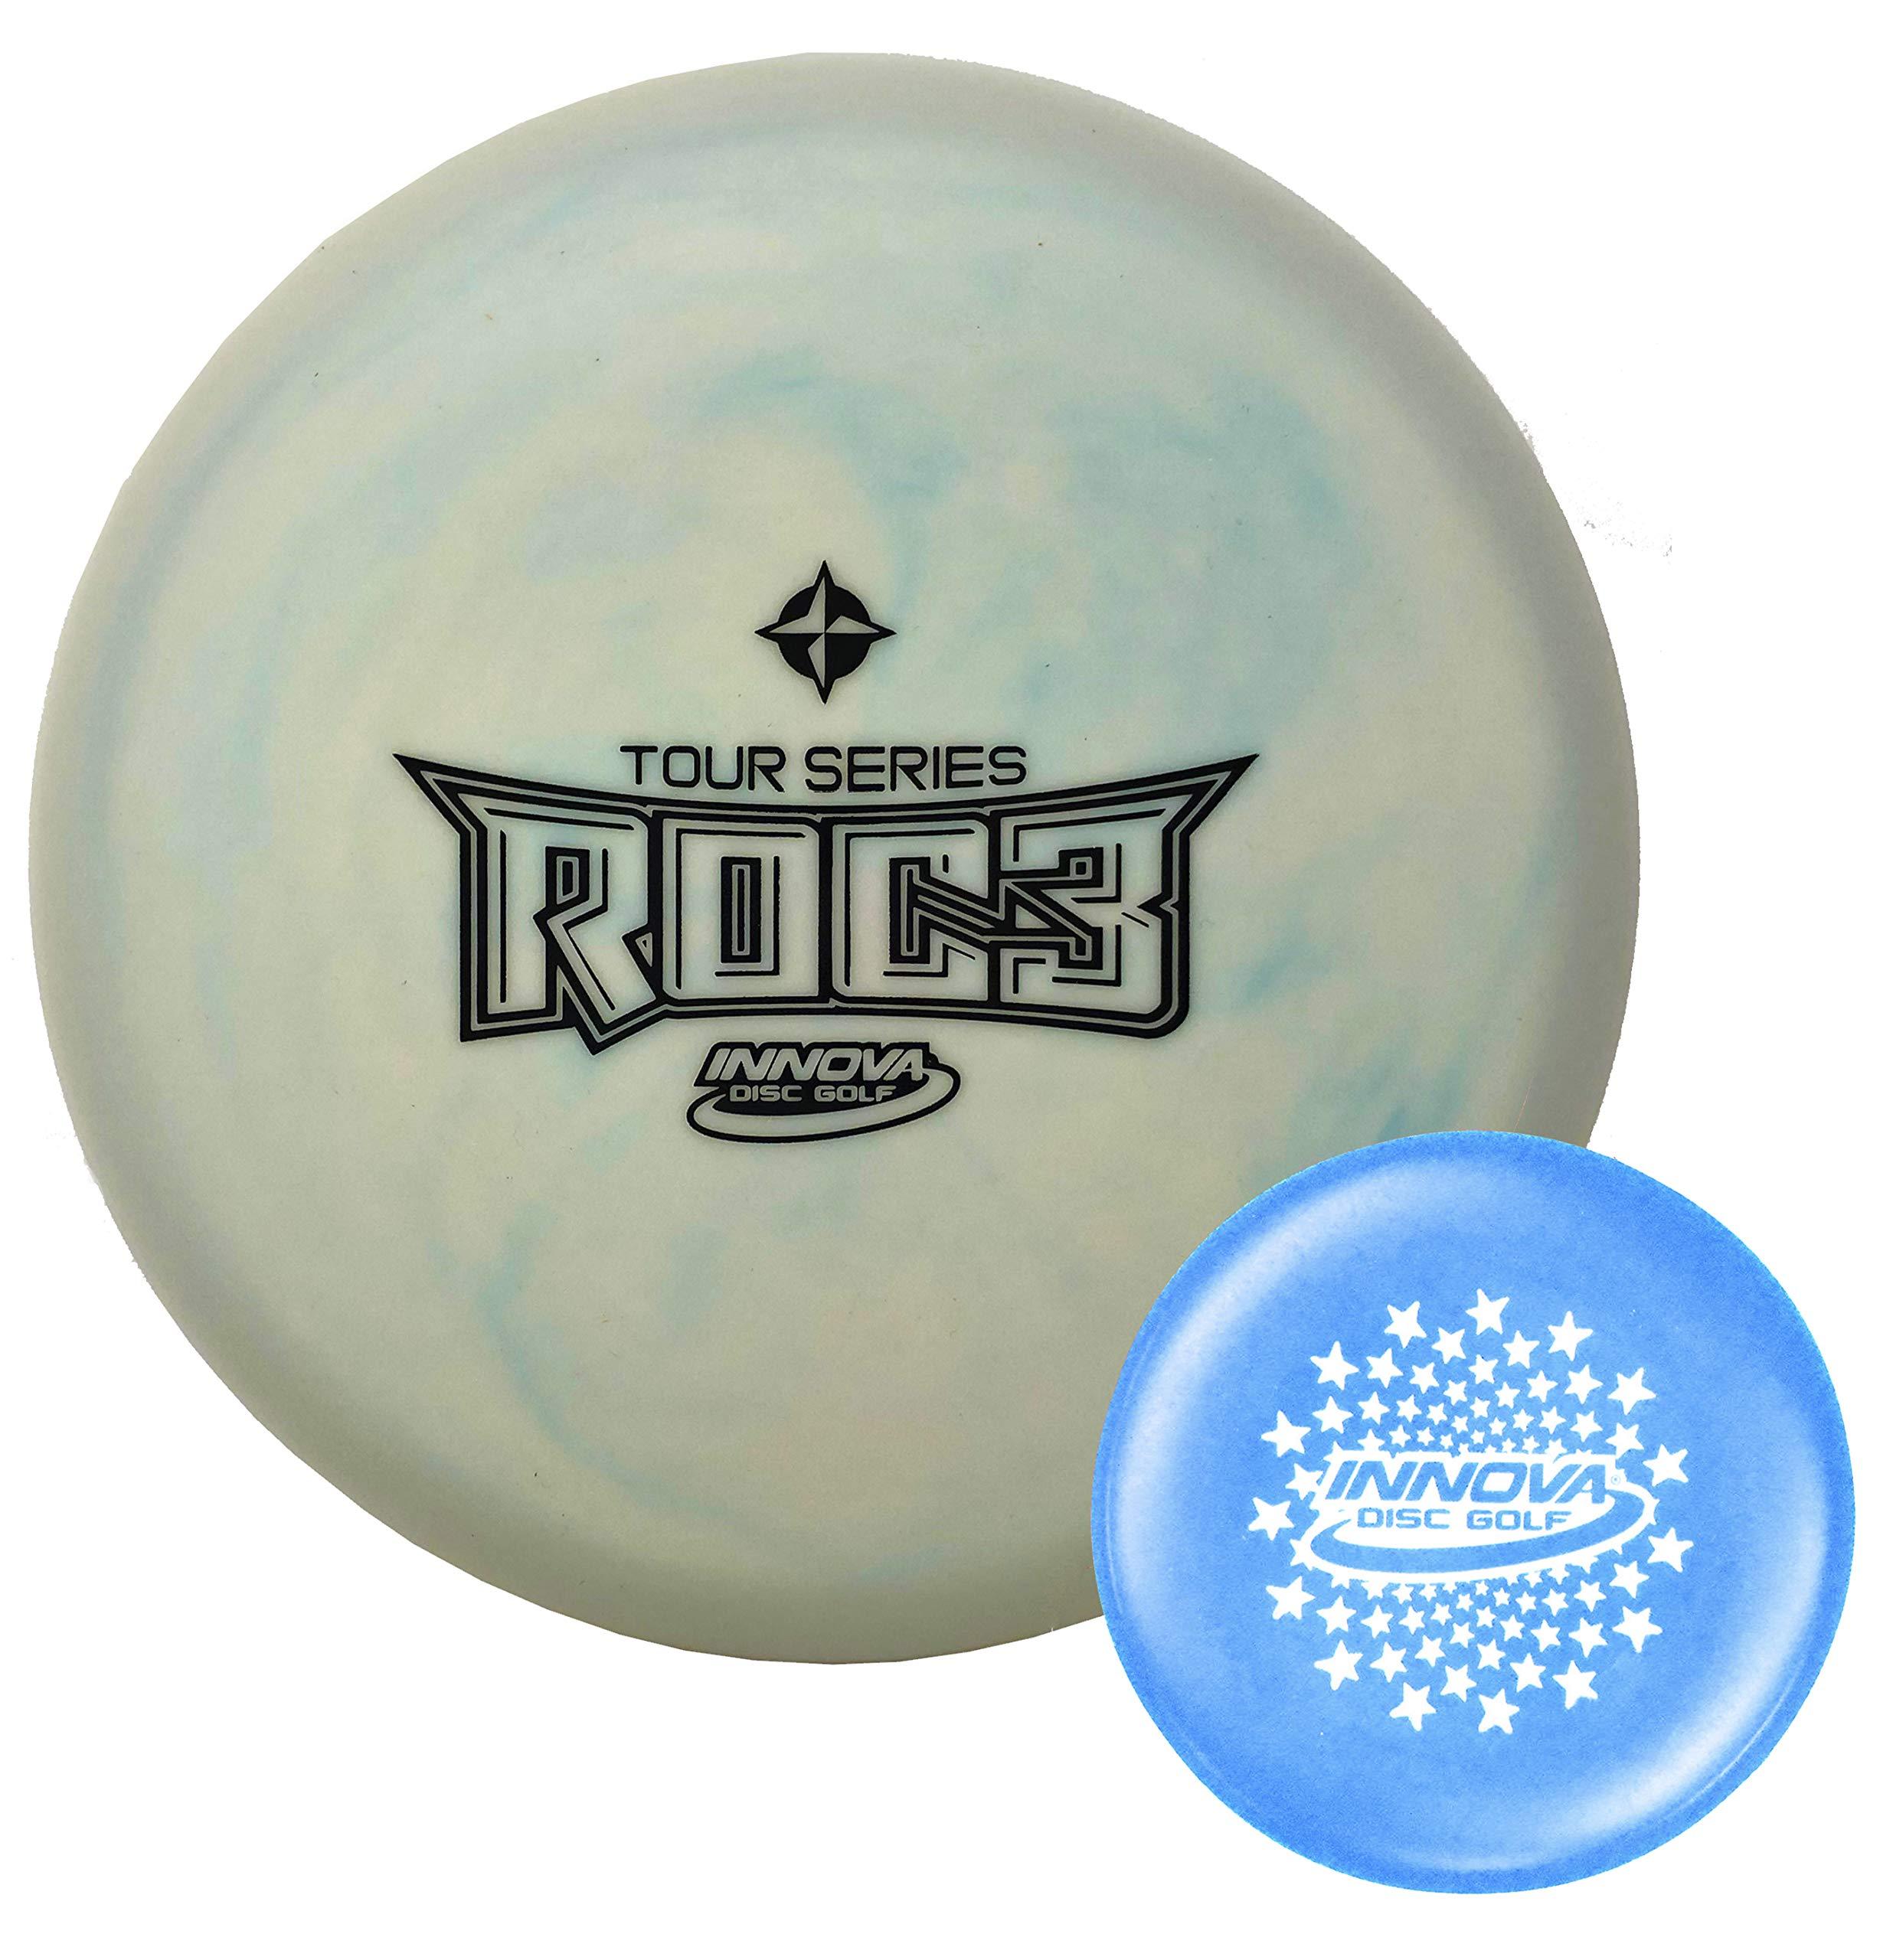 Innova Disc Golf Tour Series Glow Pro Roc3 Mid-Range Disc 178-180g with Stars Stamp Innova Mini (Colors Will Vary)